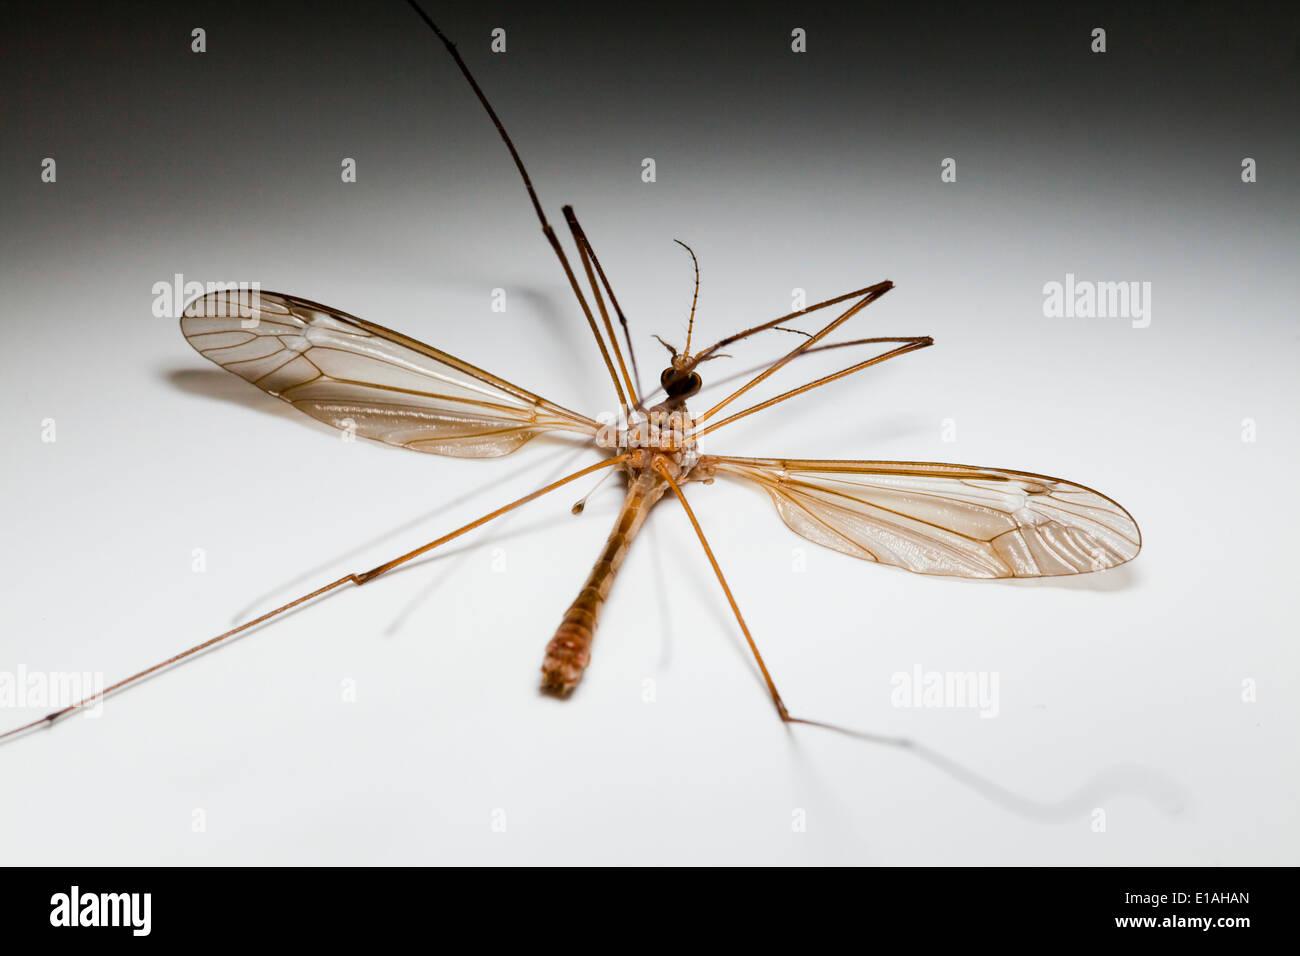 Dead crane fly (Diptera tipulidae) Stock Photo